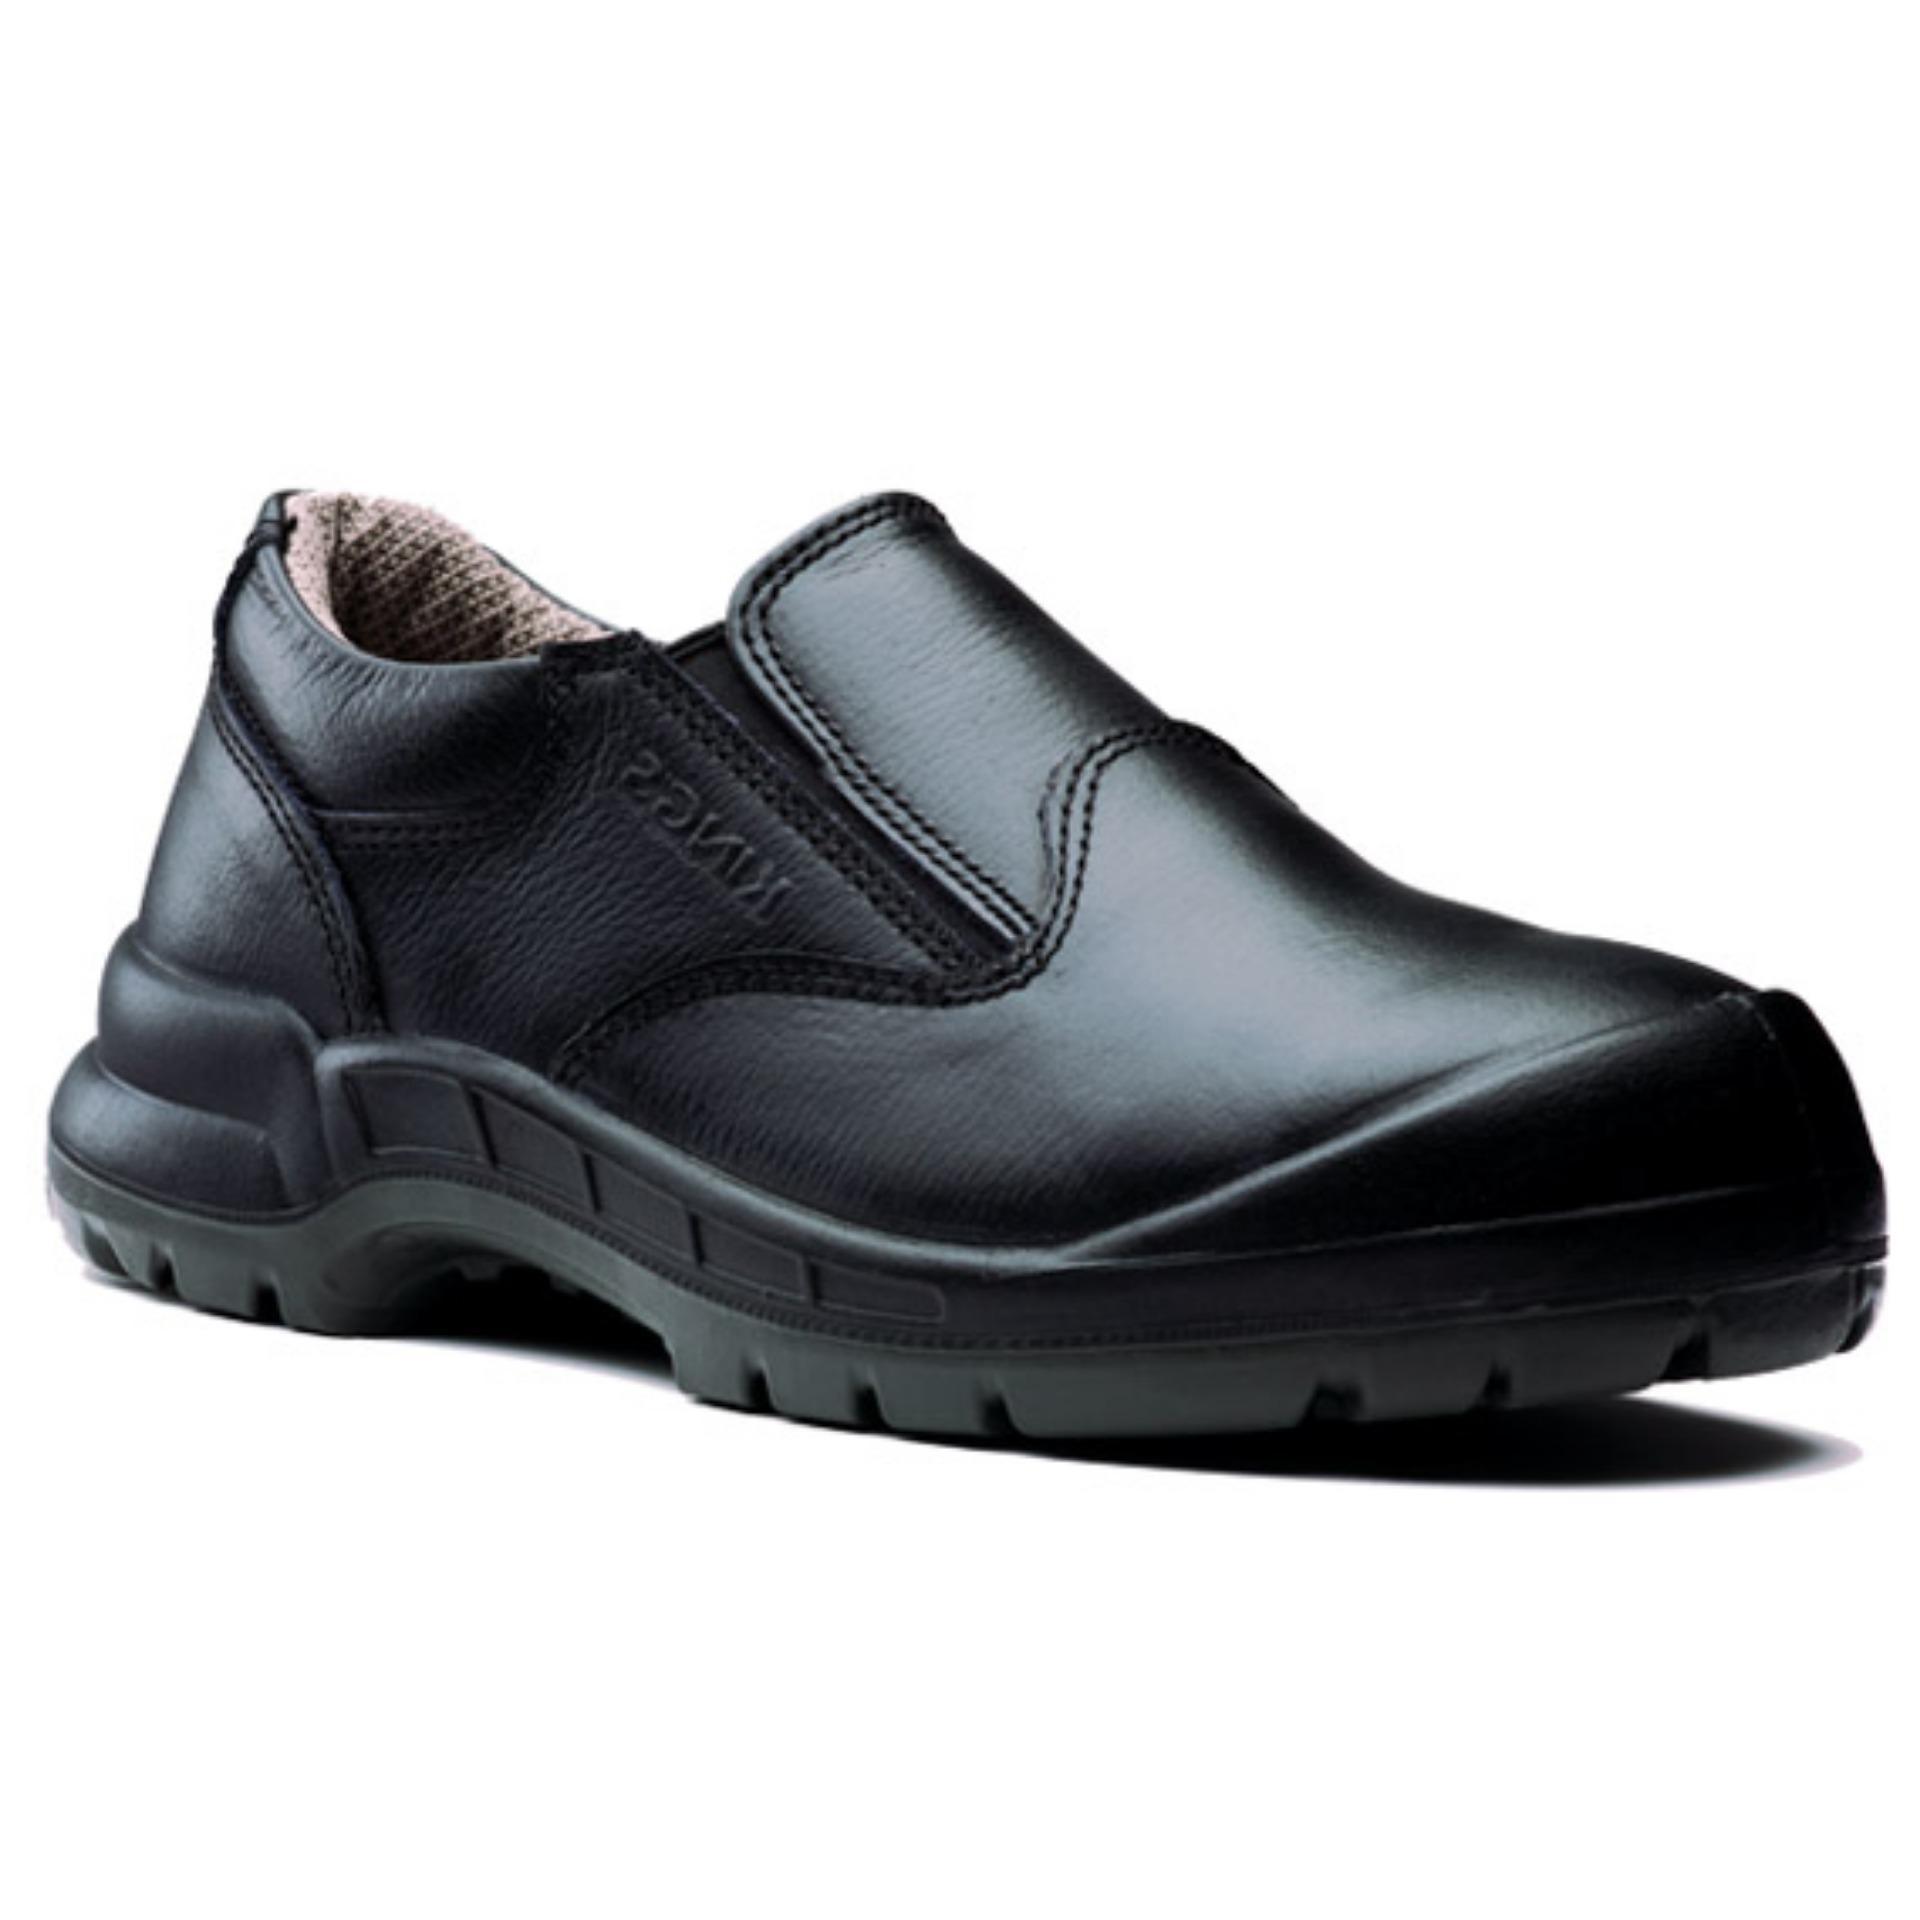 Raindoz Sepatu Safety Pria Rlix012 Strongest Daftar Harga Terbaru Widges Putih Xt 012 Kings Kwd 807